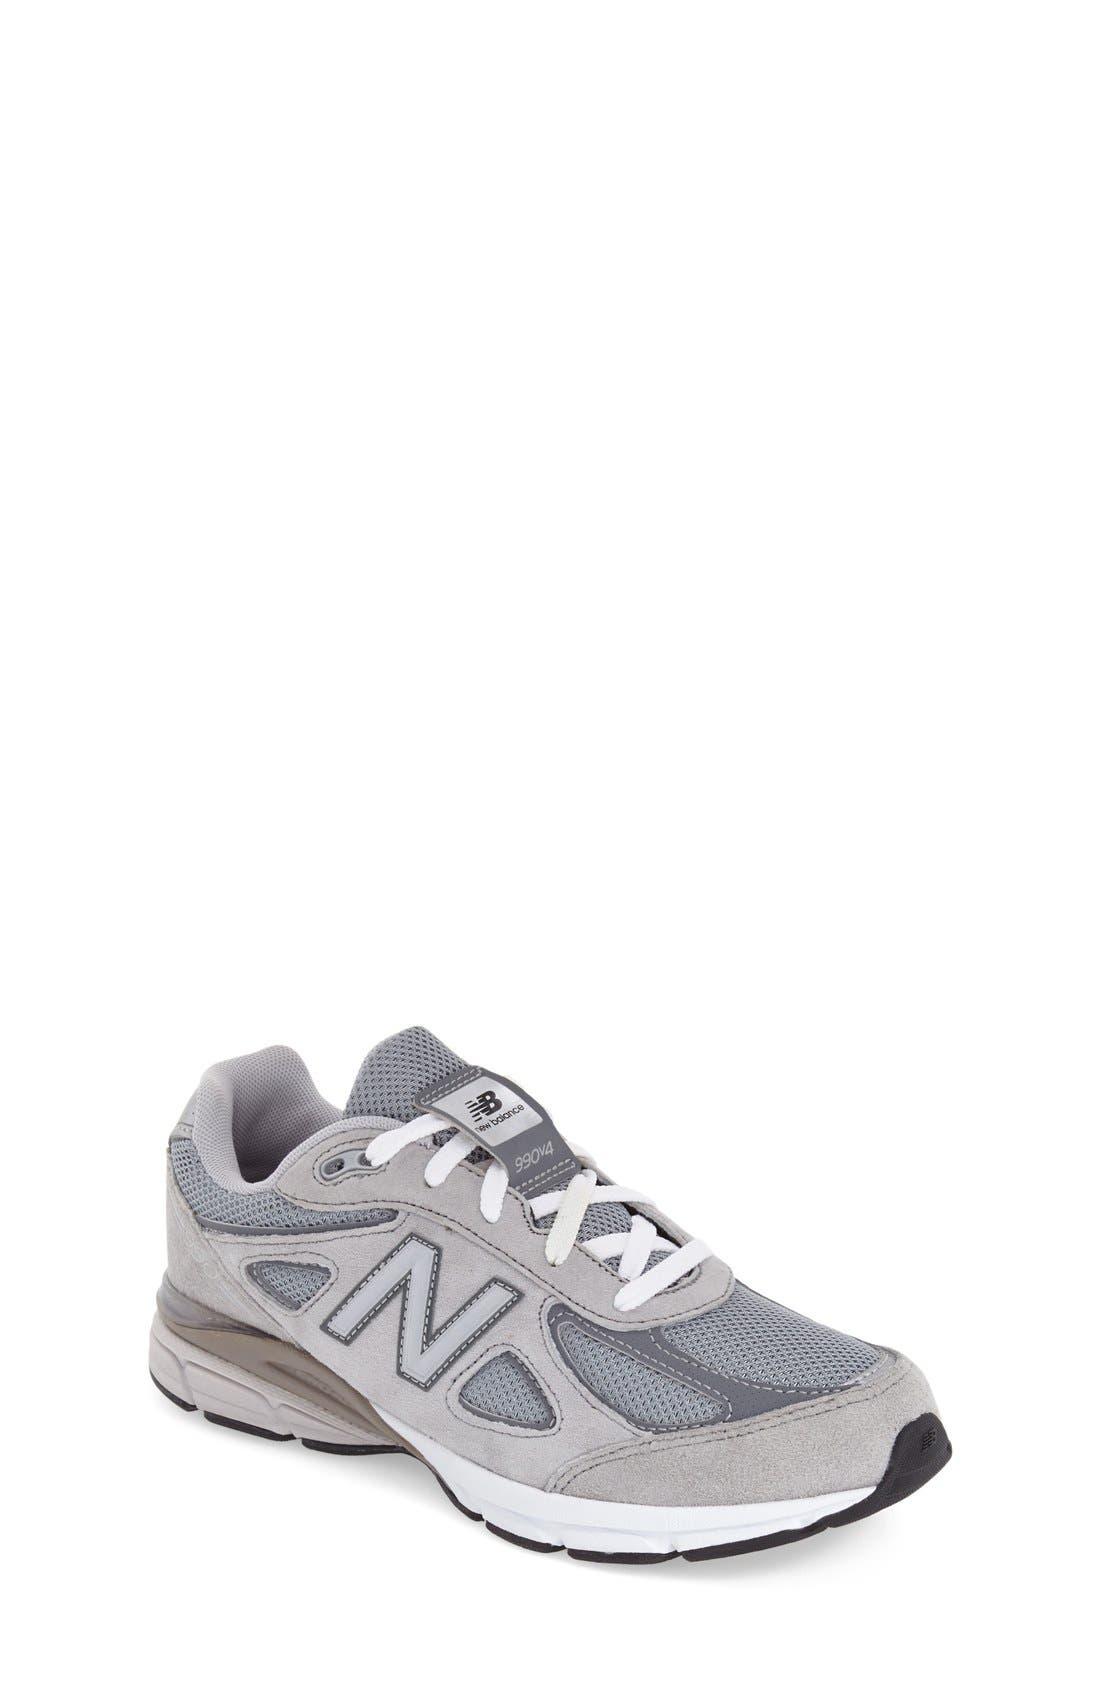 '990 Medi' Sneaker,                             Main thumbnail 1, color,                             030